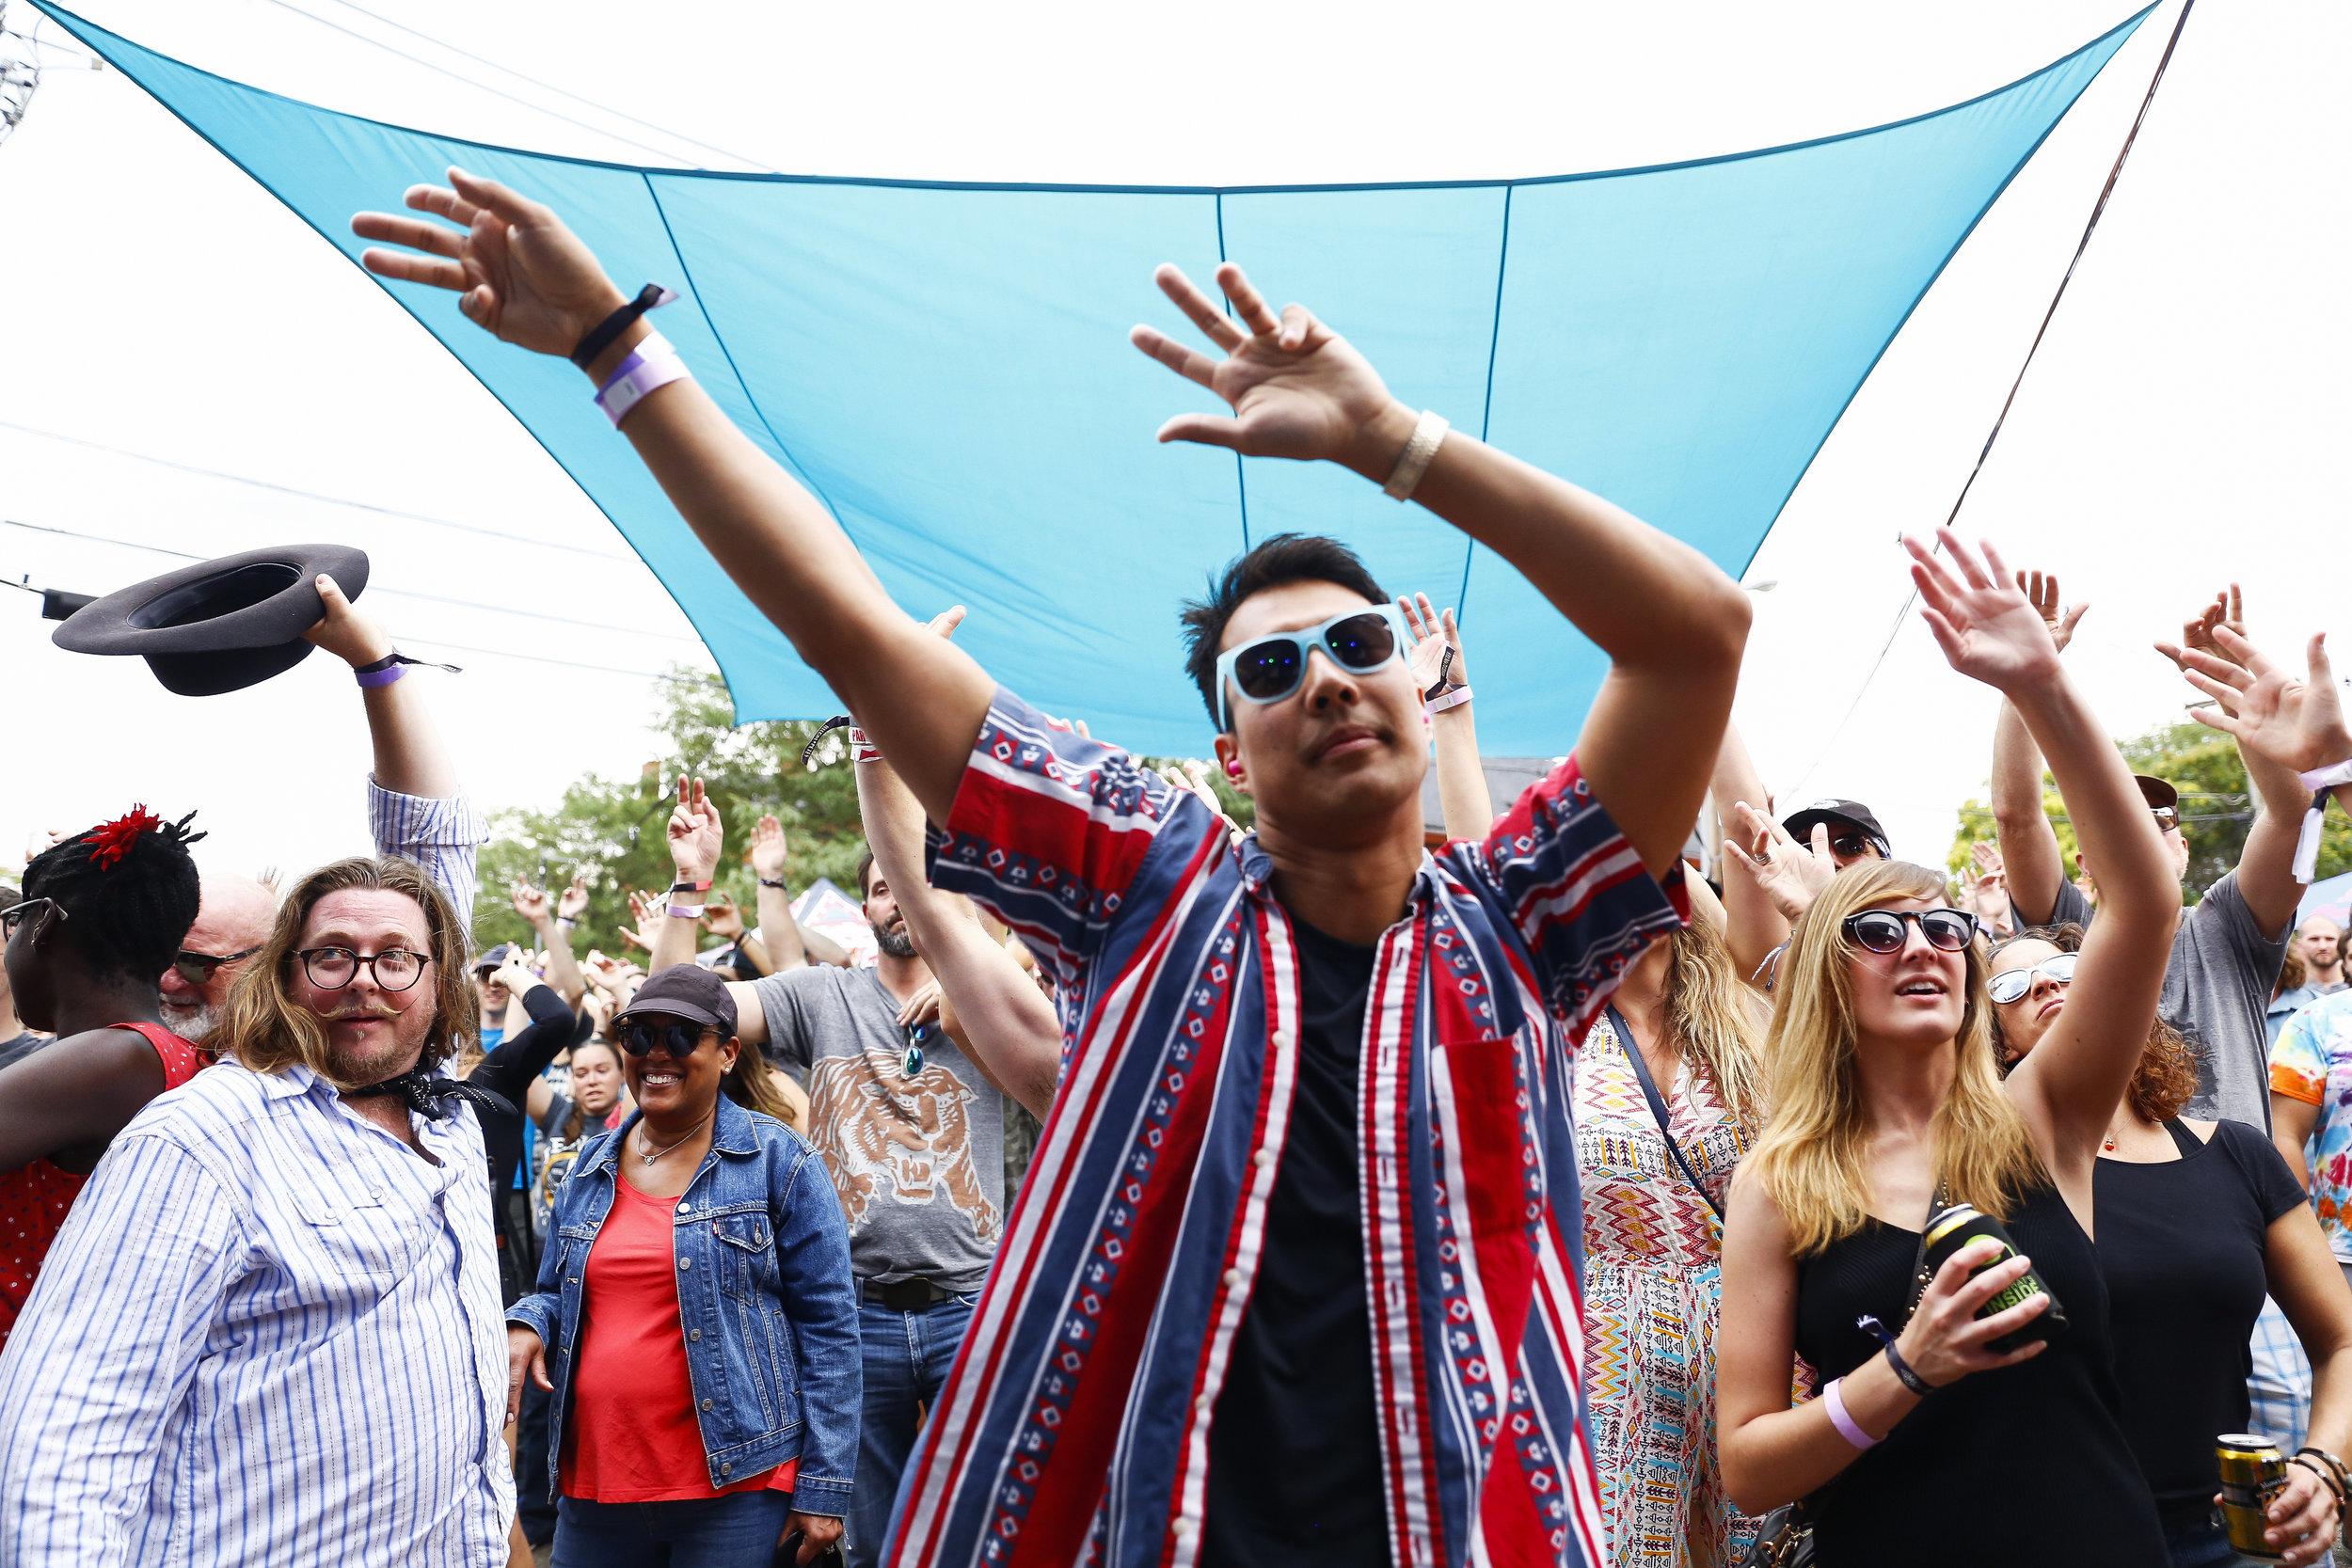 Crowds Enjoy The Underground Music Showcase. (Photo Credit: Aly McClaran)